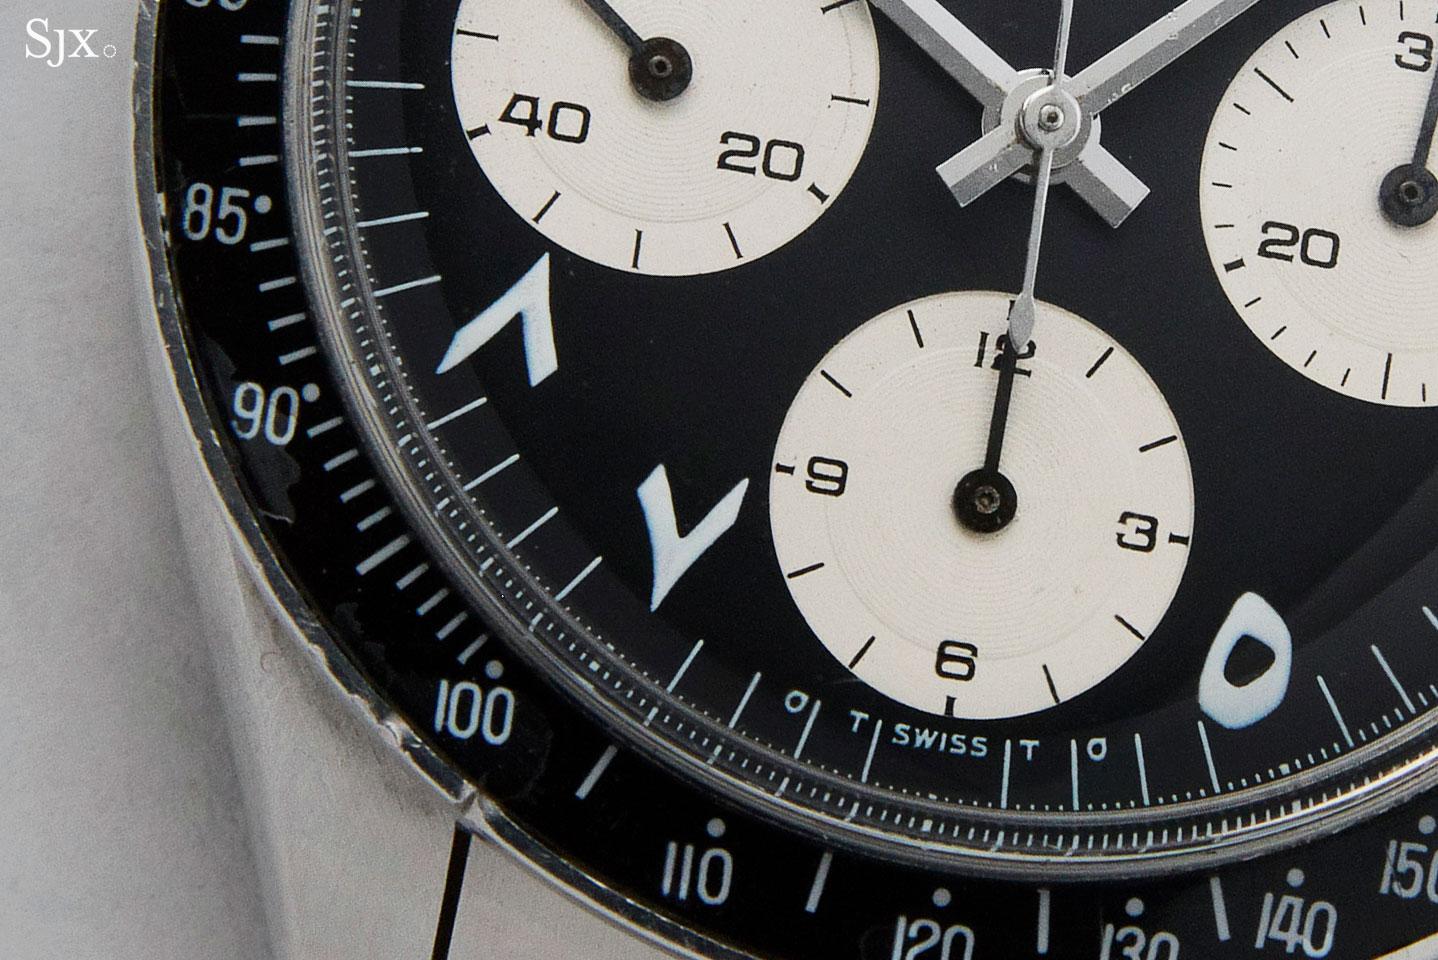 Rolex Daytona 6263 Arabic Indic numerals 2